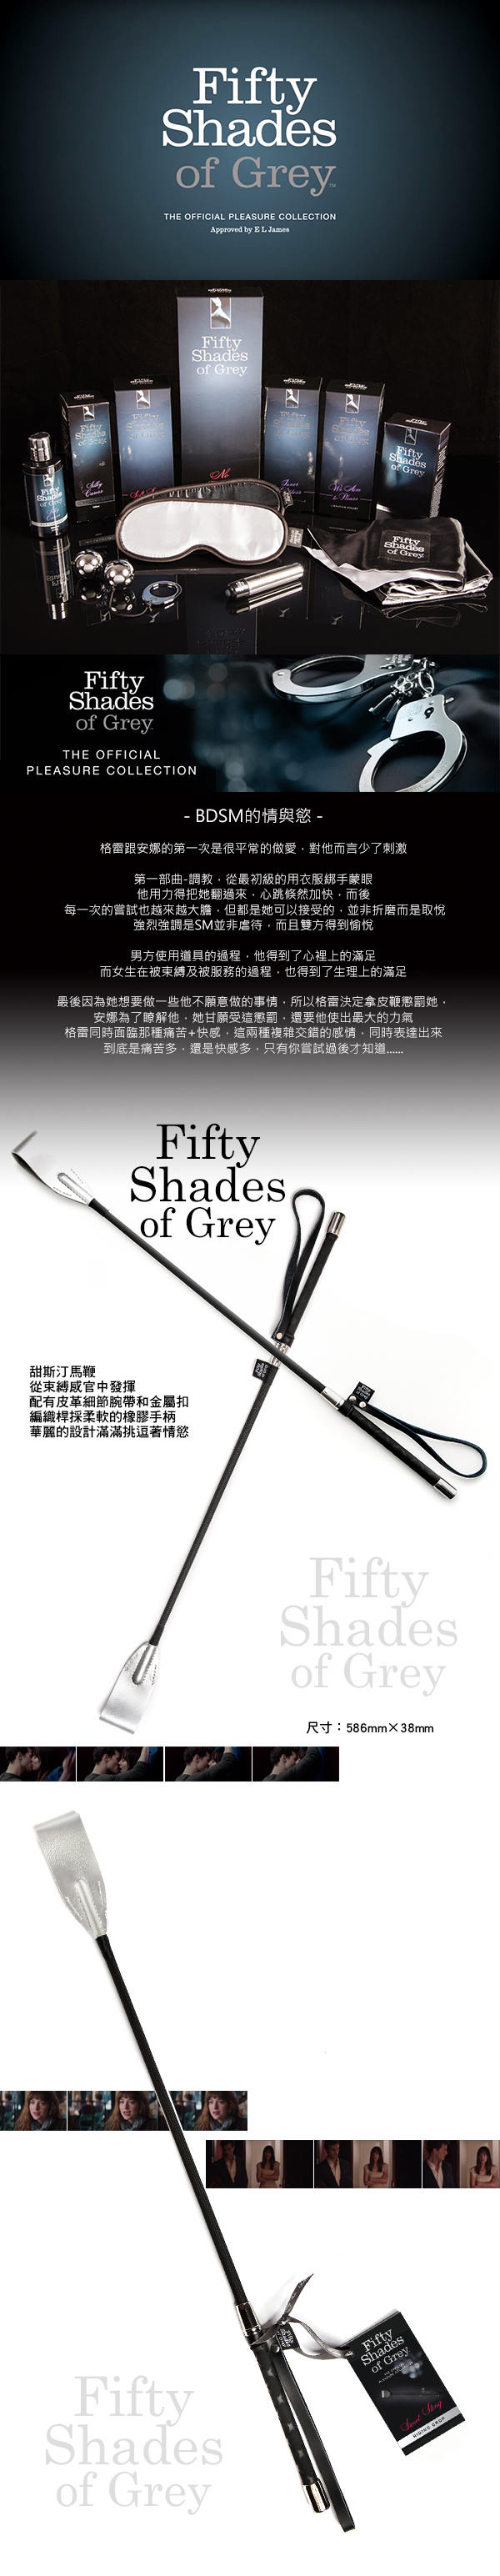 Fifty Shades Of Grey 格雷的五十道陰影 甜蜜刺痛馬鞭